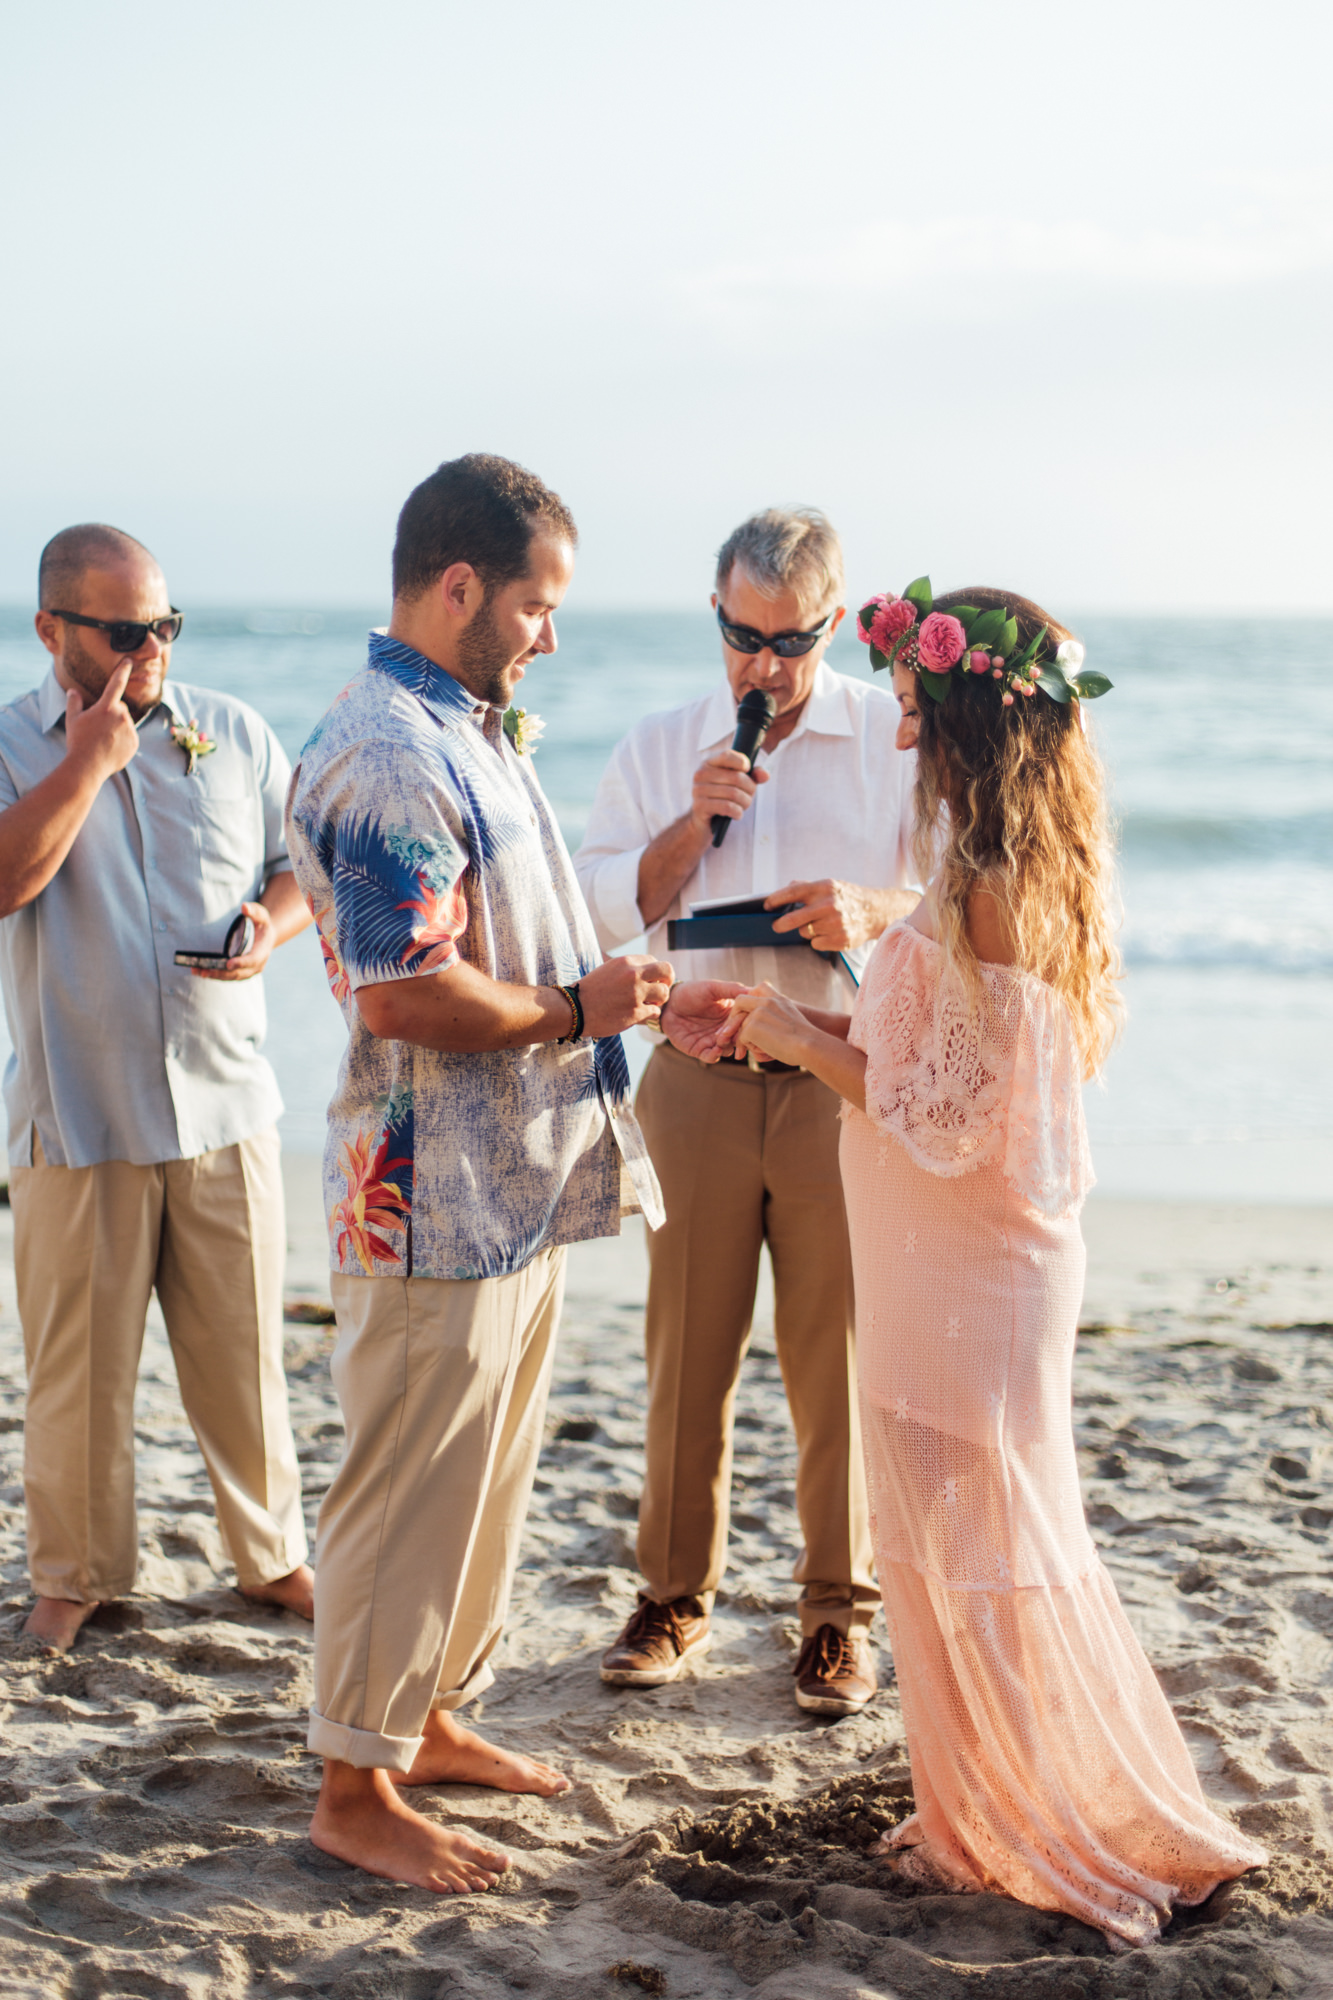 San Diego Wedding photography at Cardiff Beach024.jpg